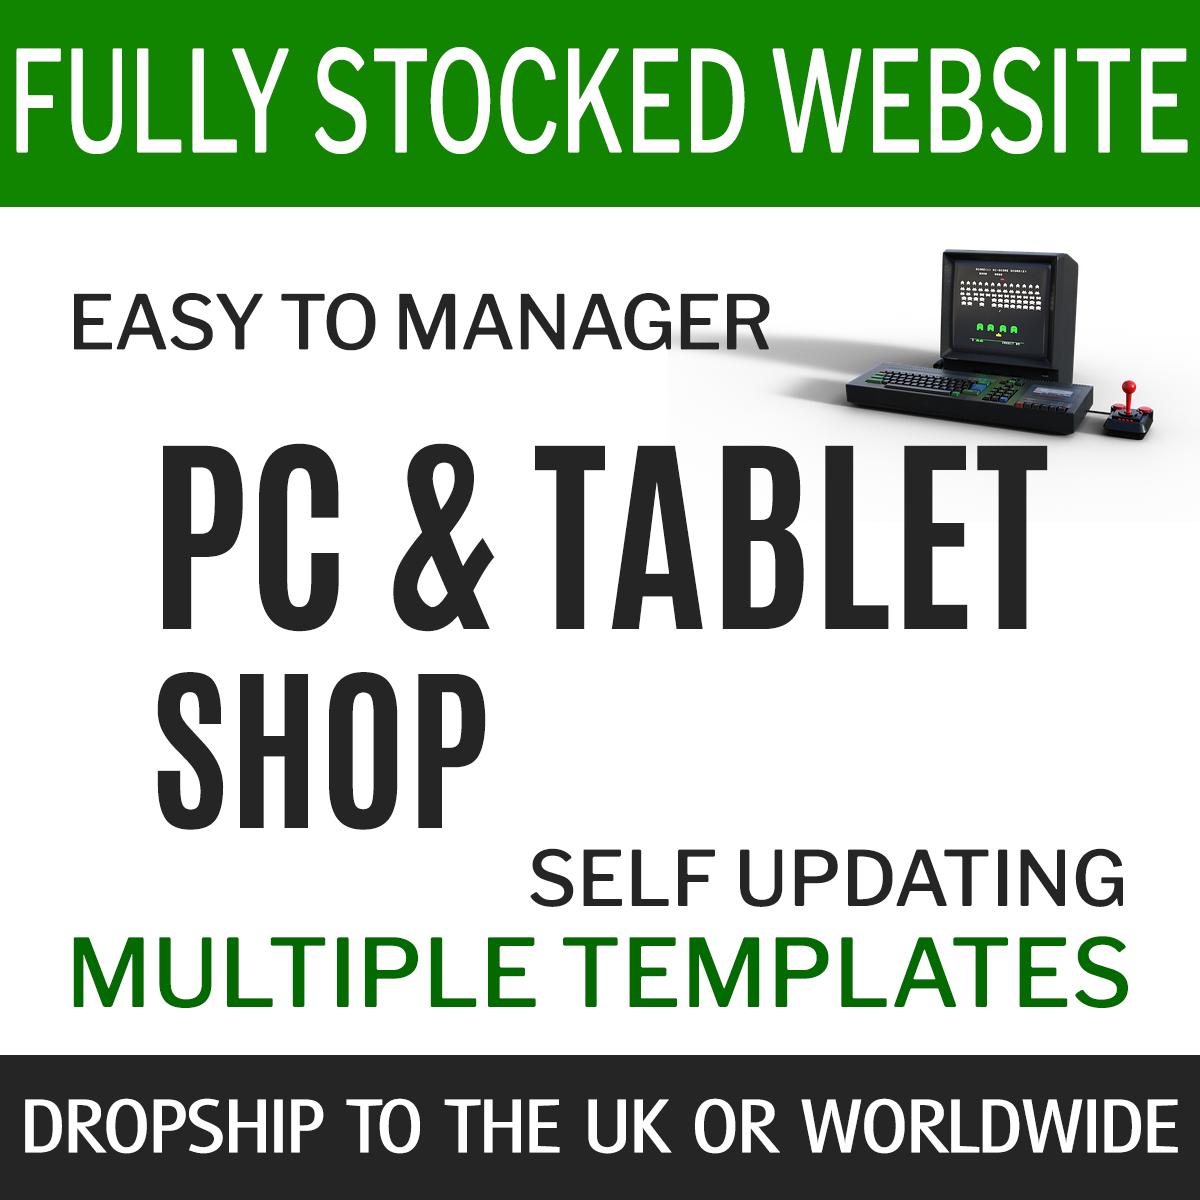 Chinavasion PC/Tablet Shop